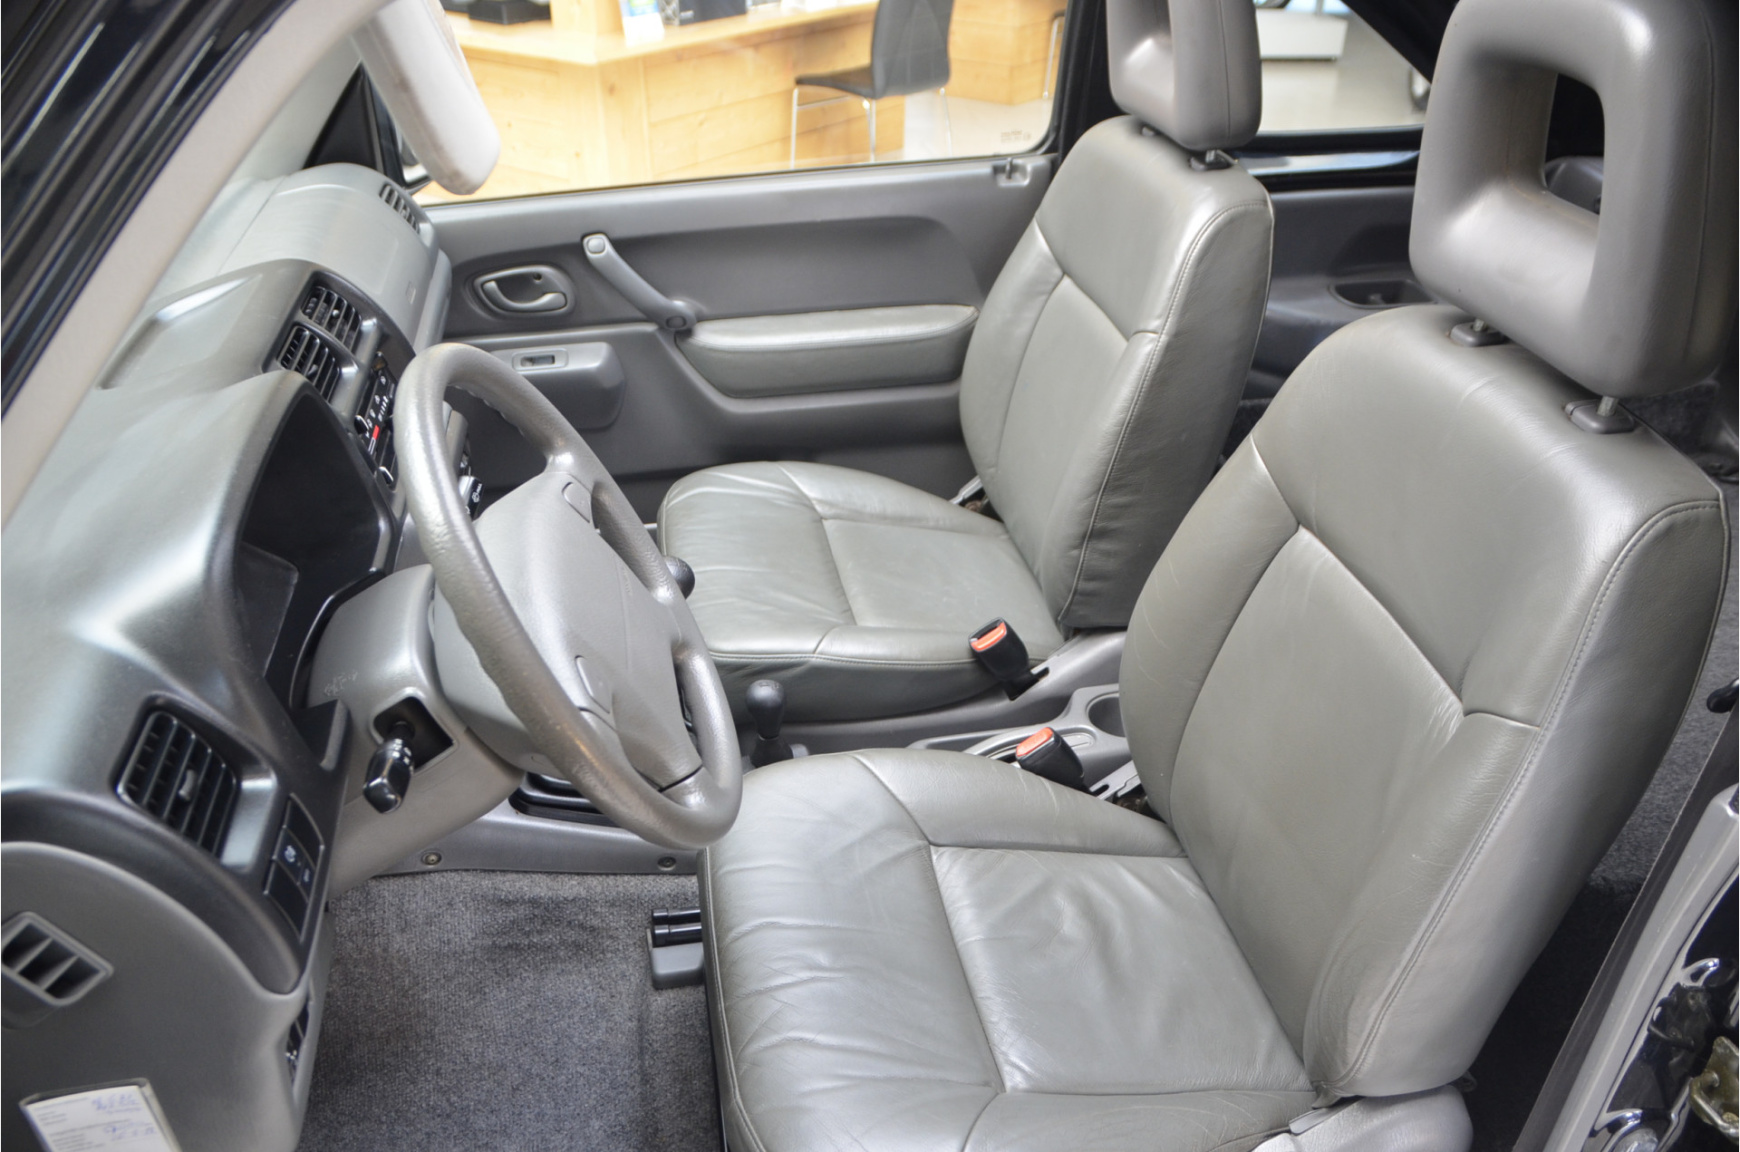 Suzuki-Jimny-14